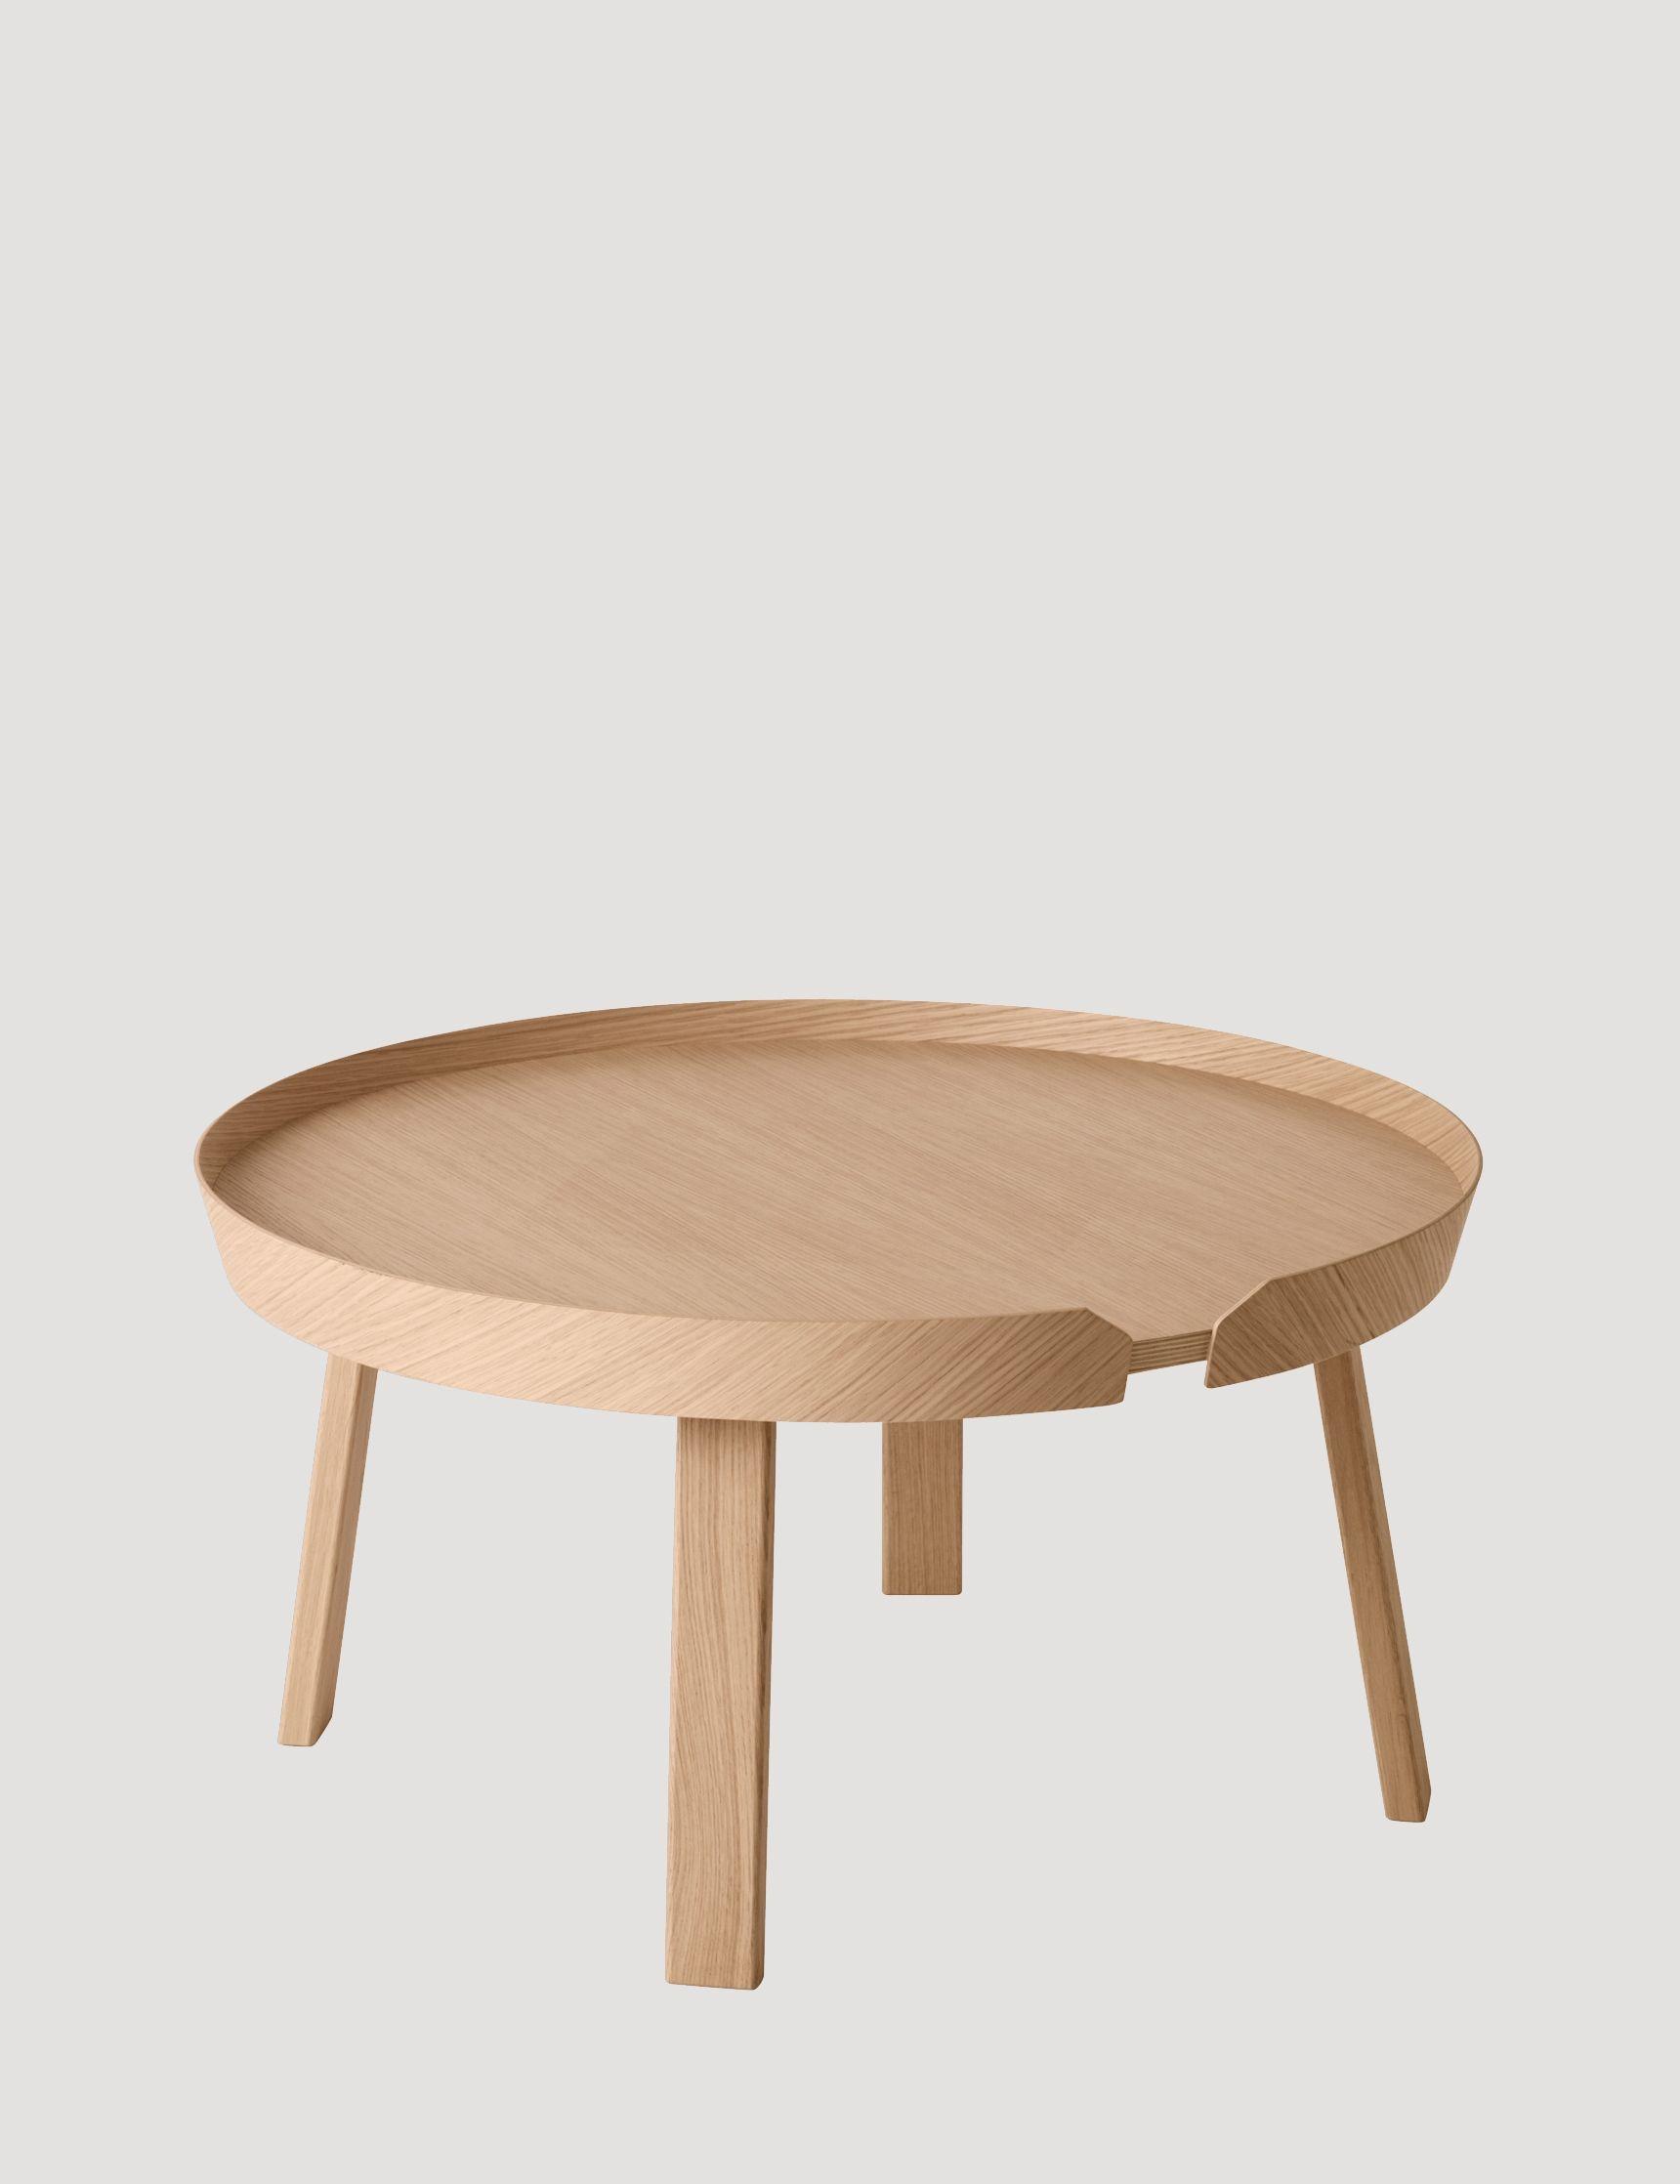 Around – Modern Scandinavian Design Sofa Table by Muuto Muuto